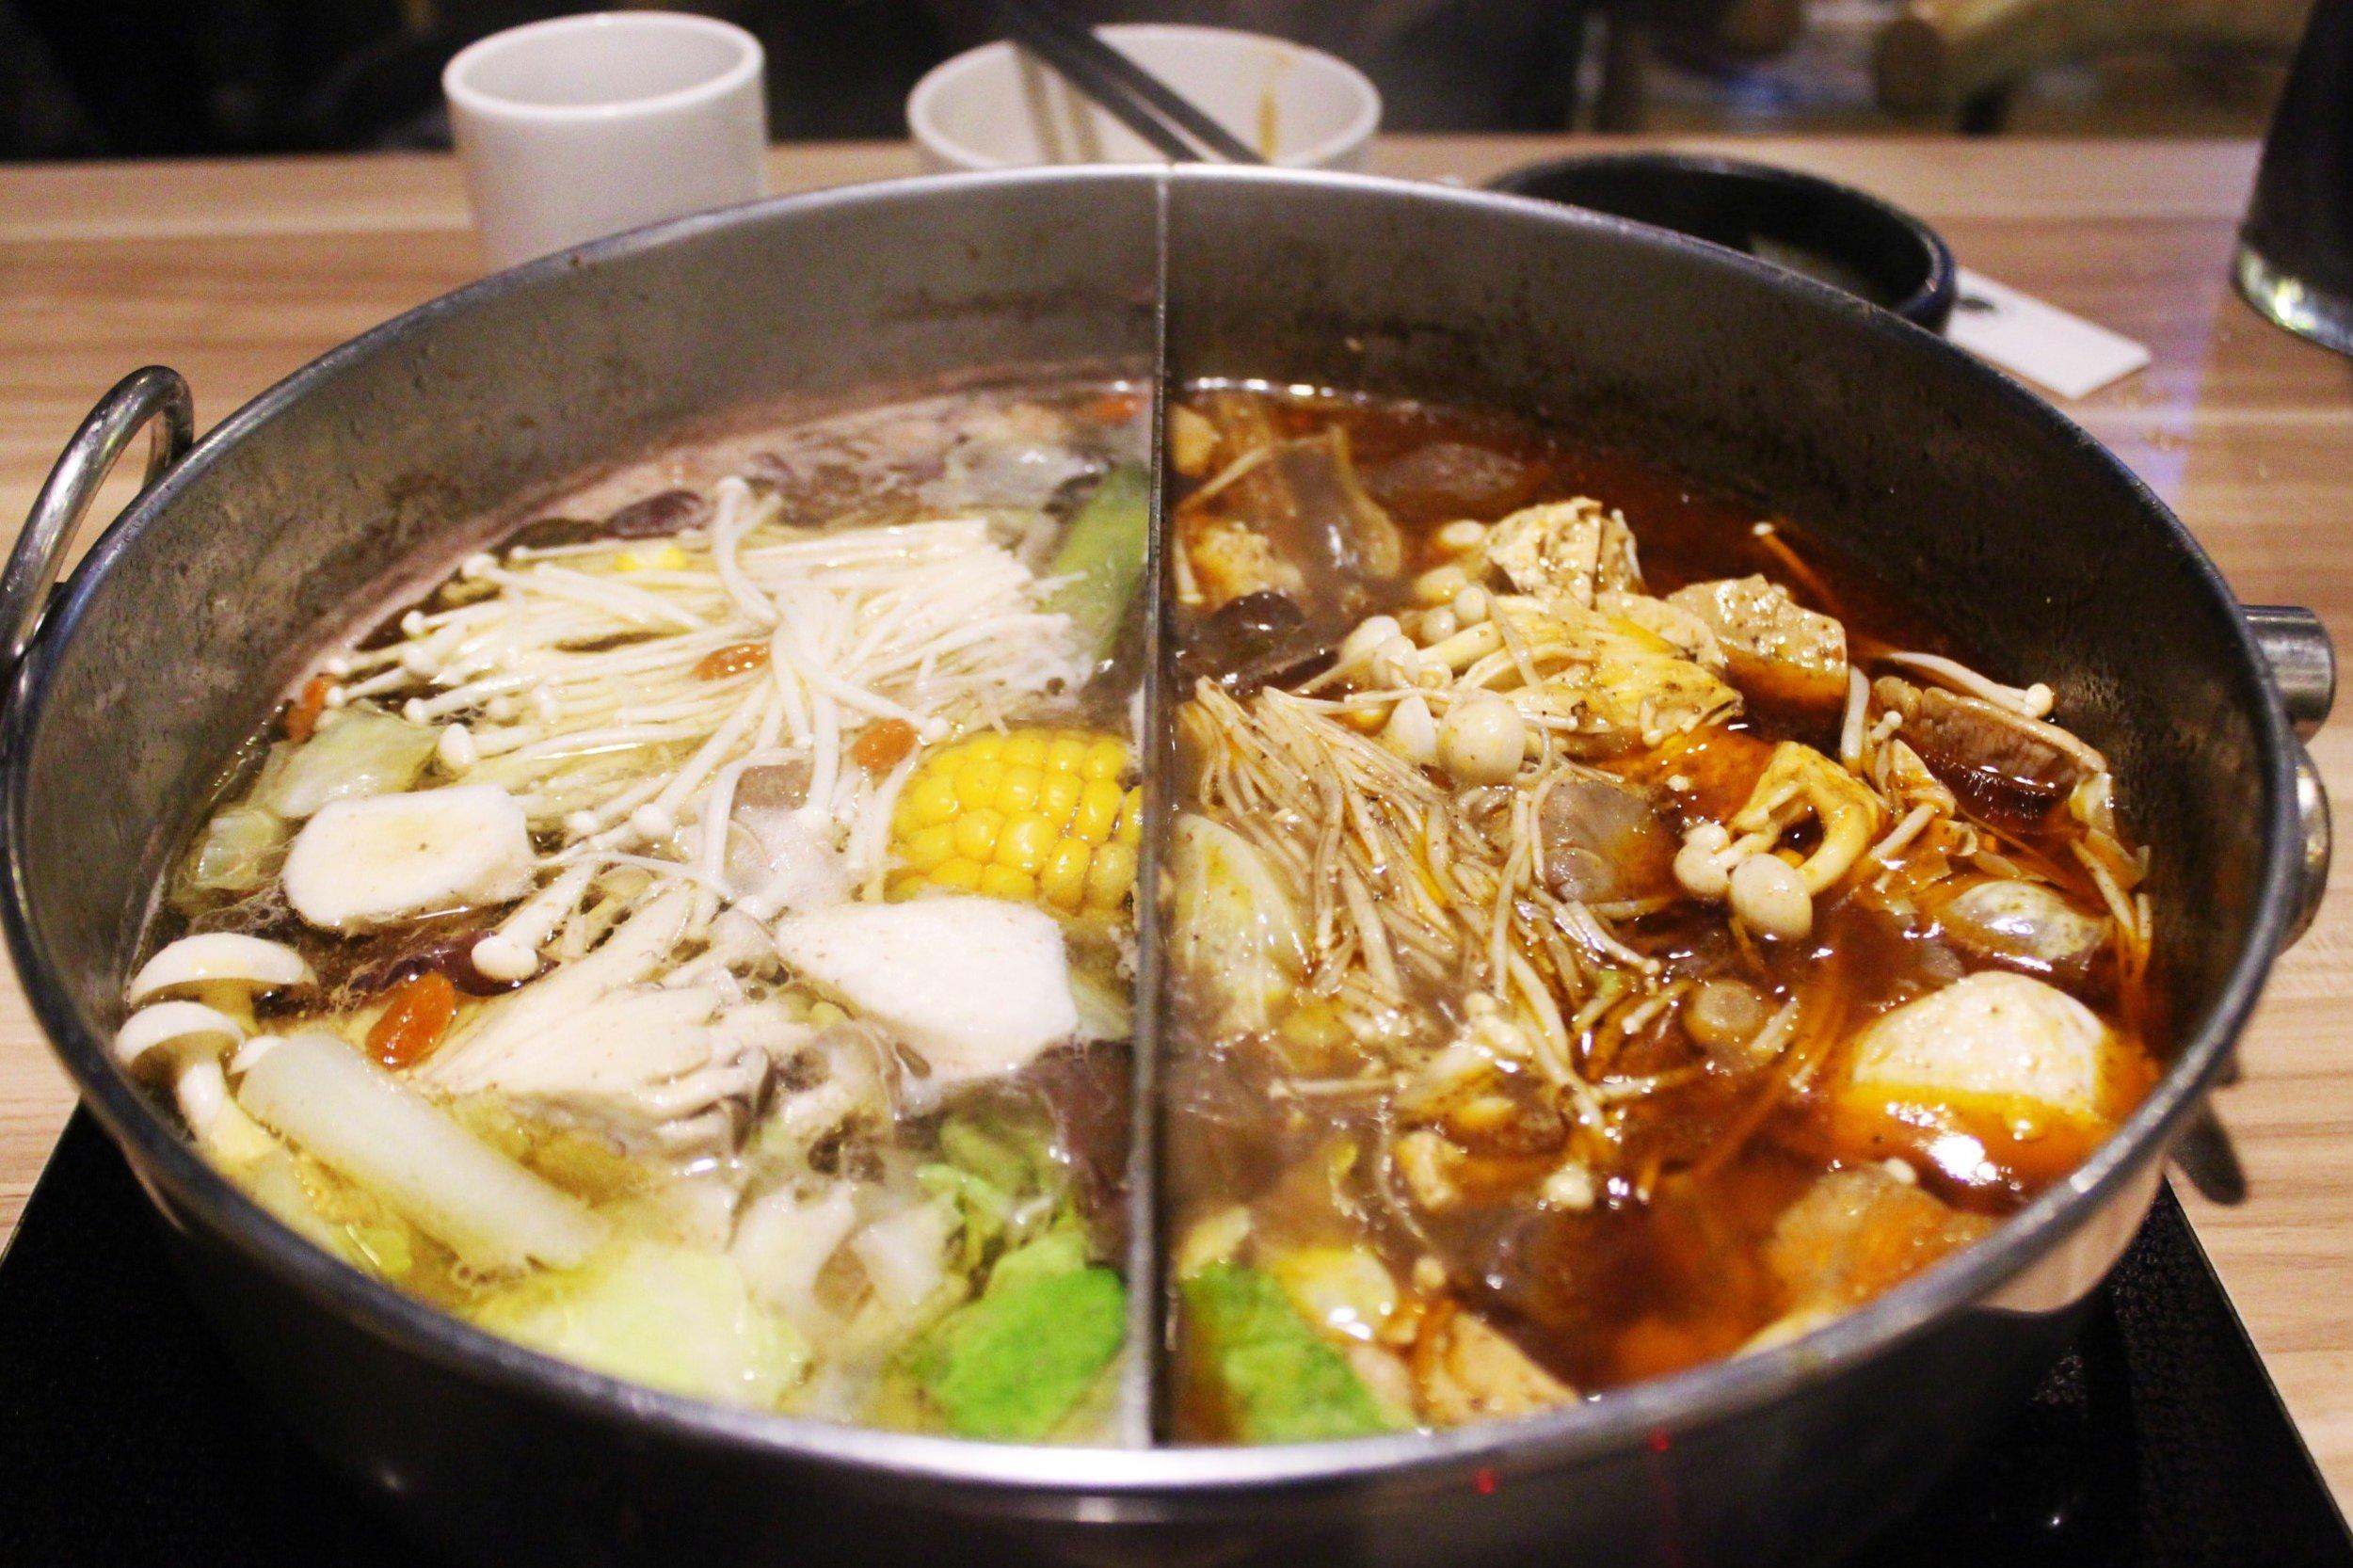 Half n Half Hotpot 紅白鍋at 大師兄麻辣鍋物 in Taiwan